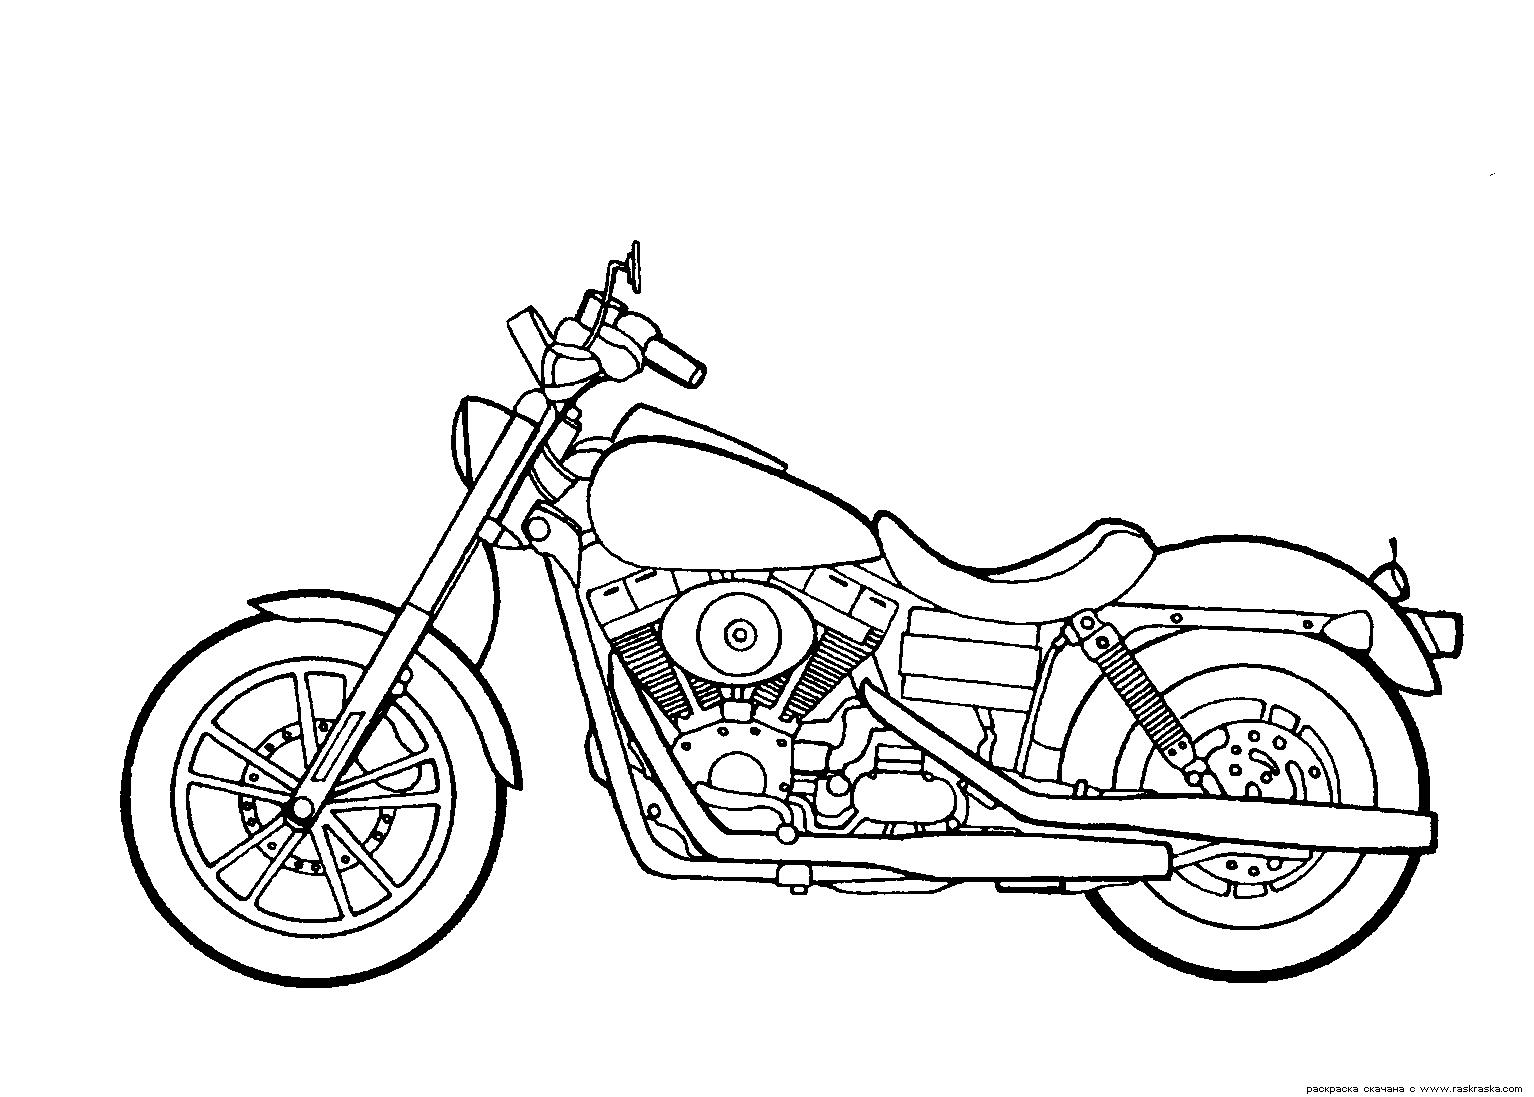 Harley Davidson clipart pencil sketch Motorcycles Glide Dyna Super Harley